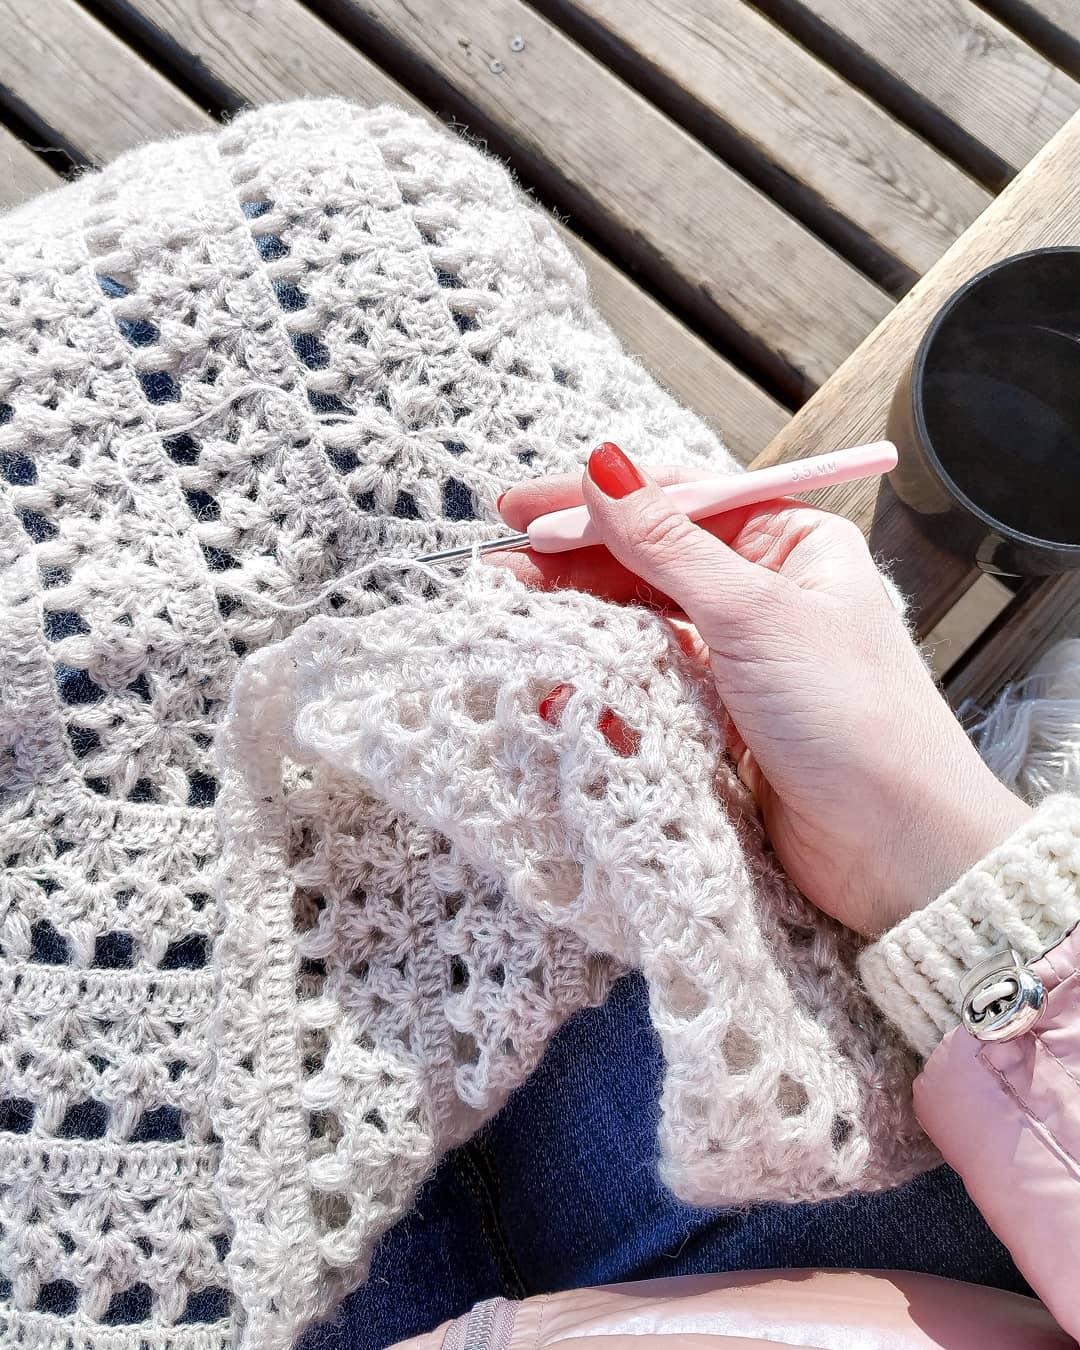 I Crocheted My First Shawl 🐭 It Is Very Crochetpattern - Crochet Shawl